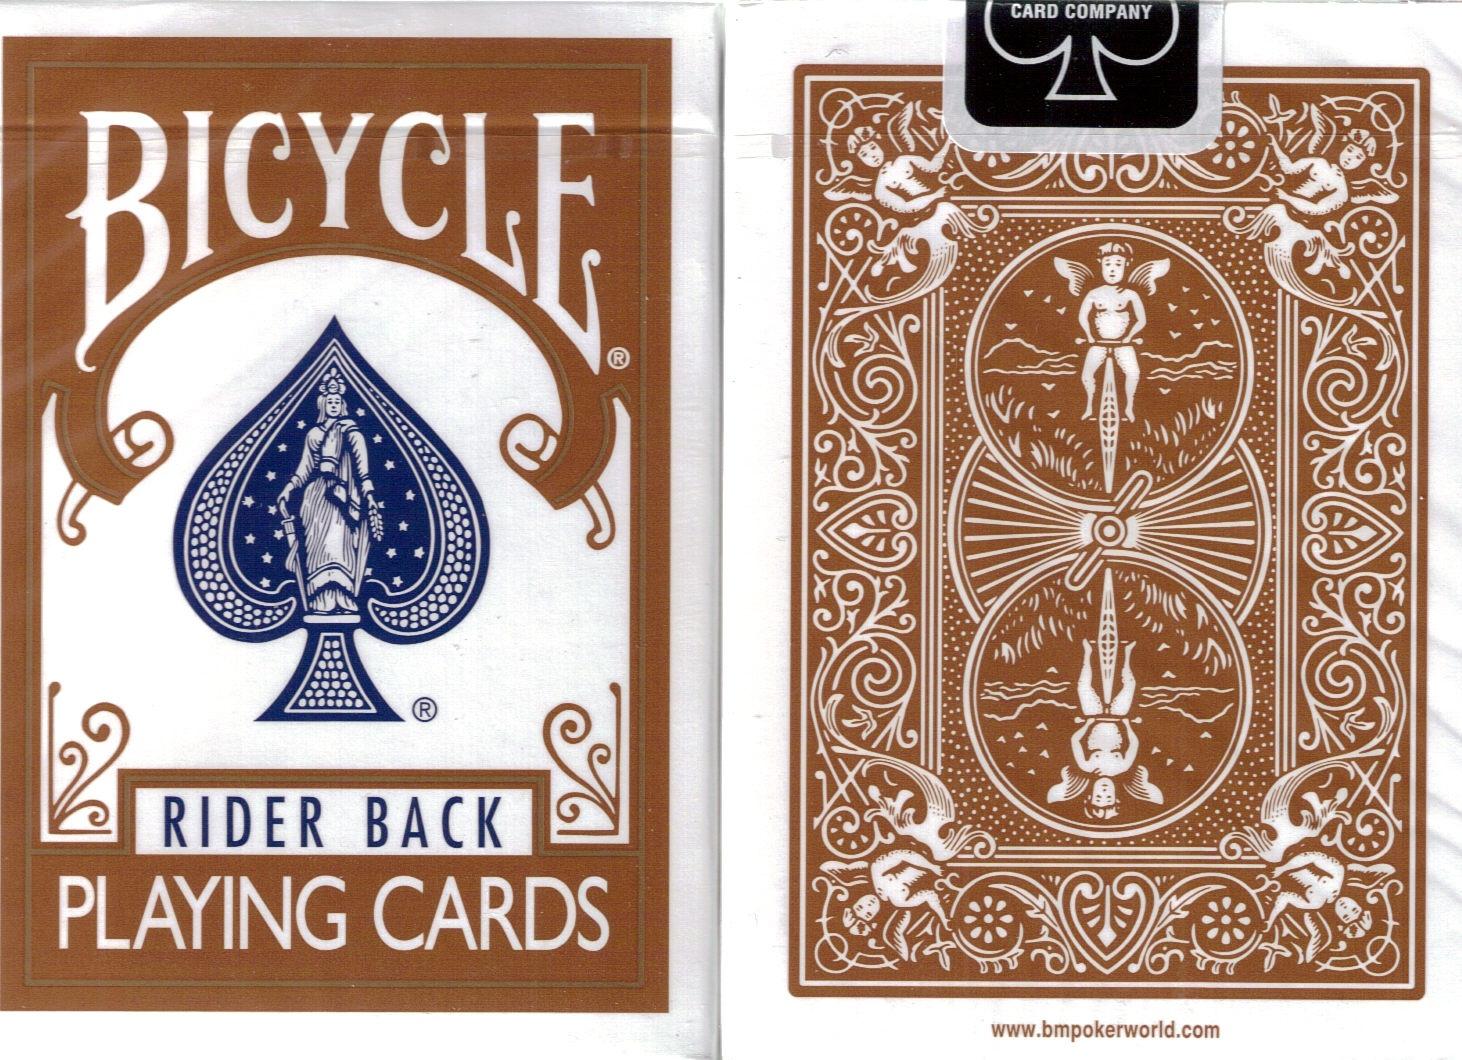 Bicycle bicycle casino usa slots casino